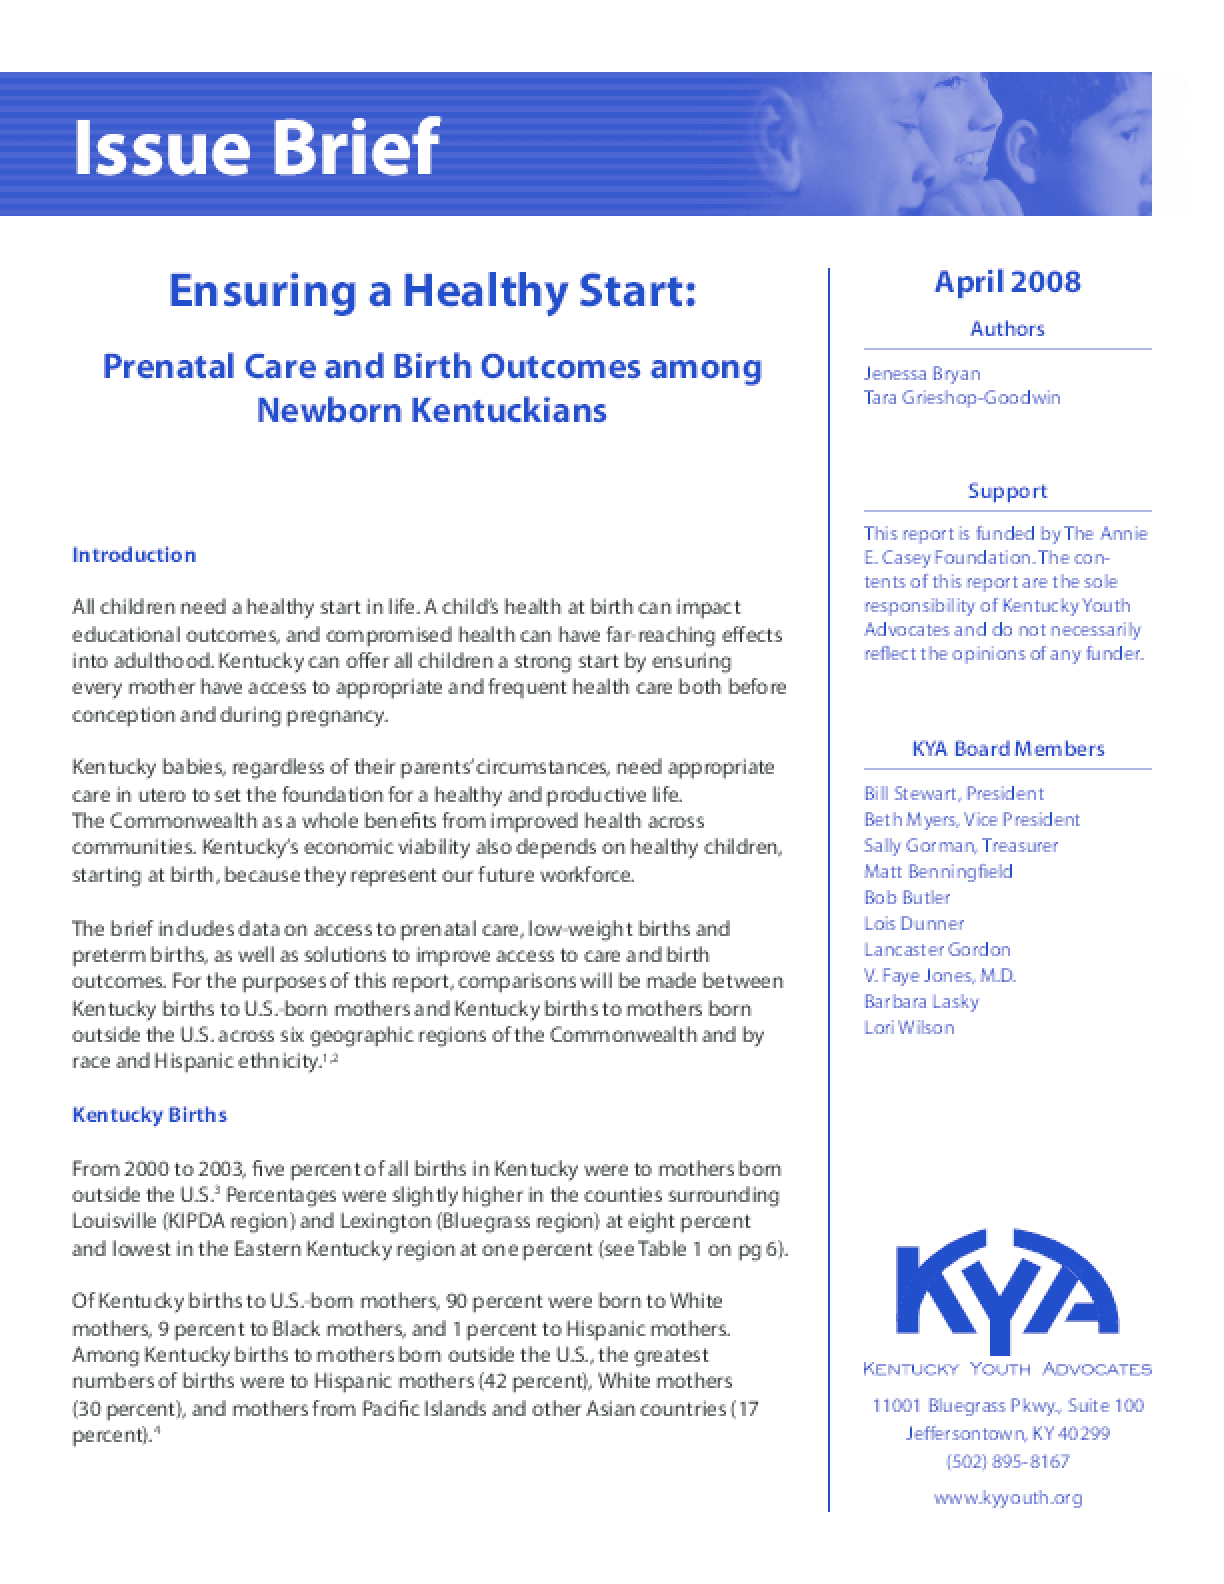 Ensuring a Healthy Start: Prenatal Care and Outcomes among Newborn Kentuckians